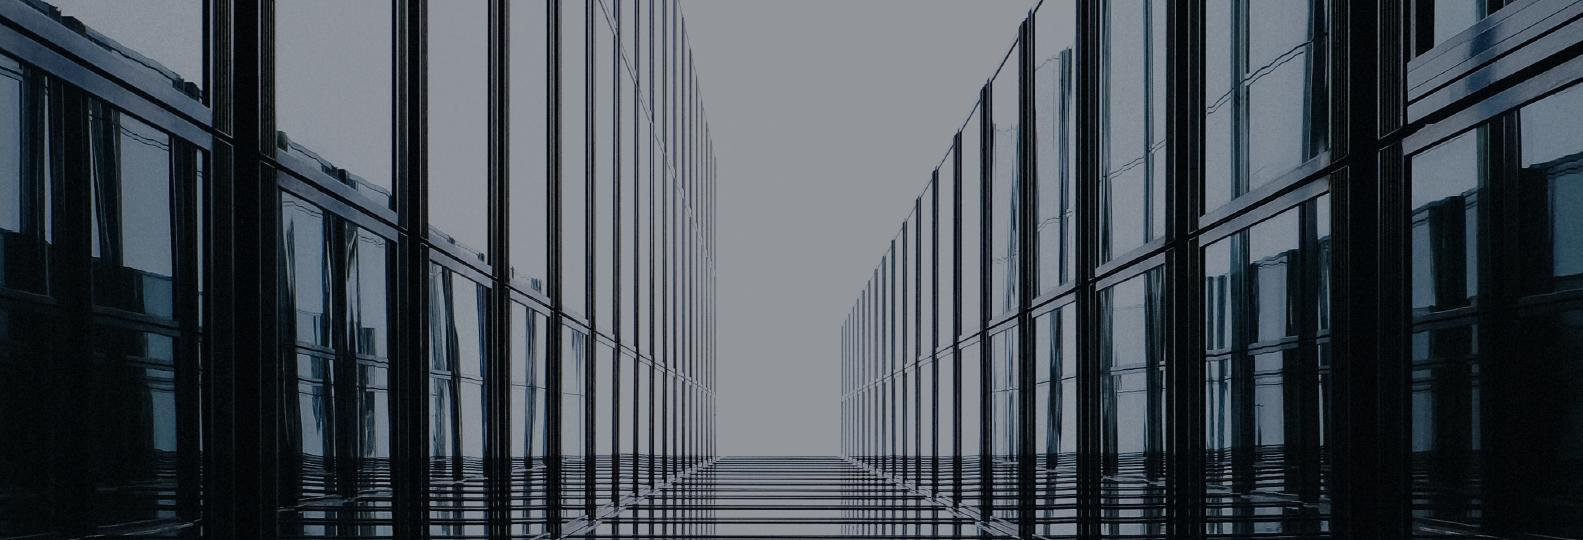 1C ERP  კომპანიის  ბიზნეს პროცესების სრული ავტომატიზაცია